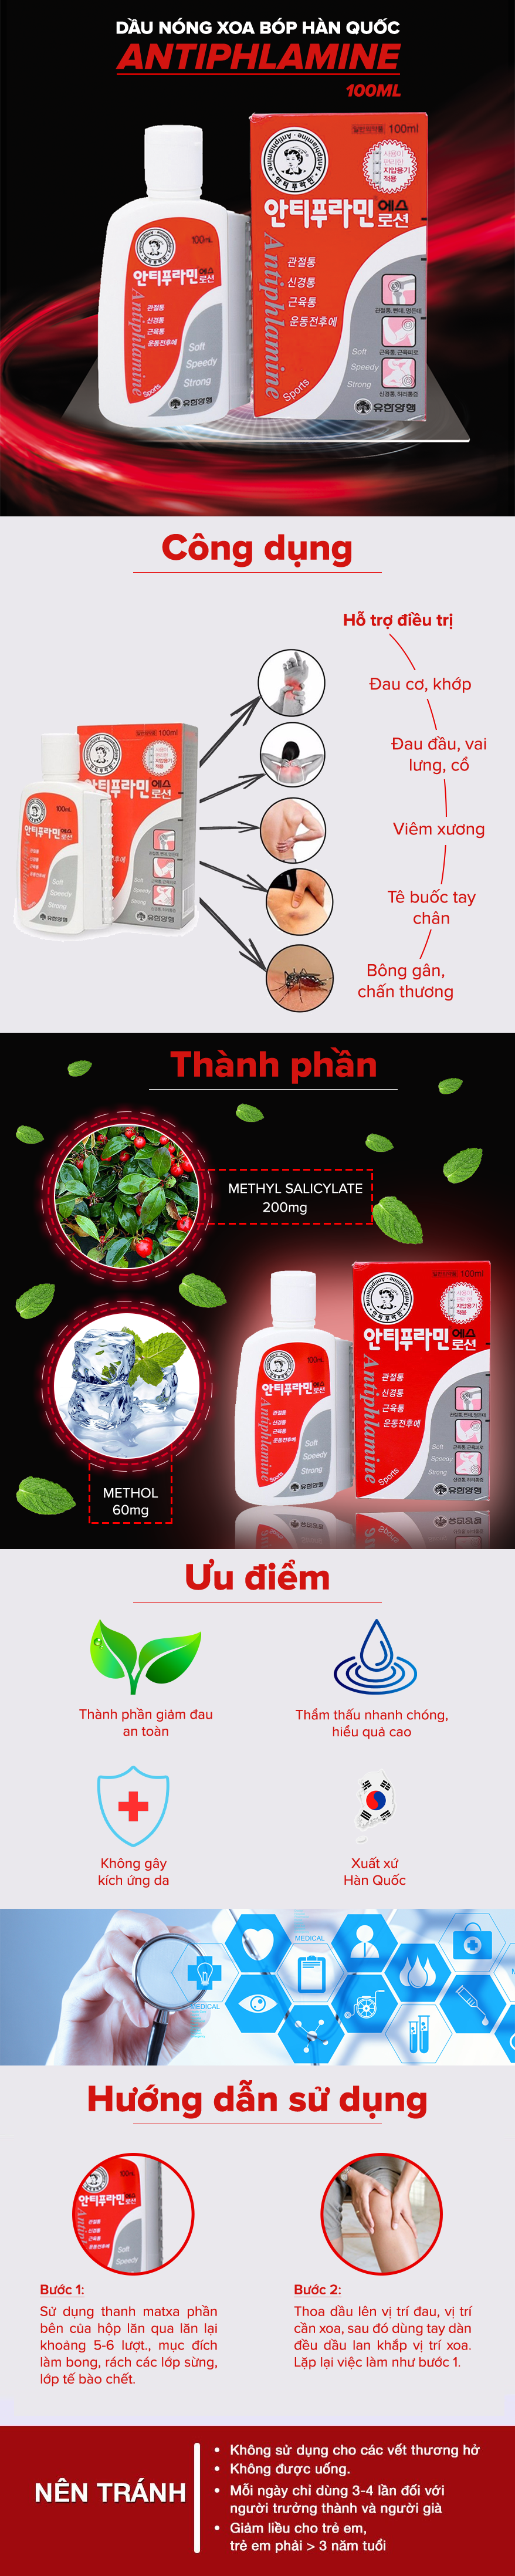 Bộ 3 Chai Dầu nóng Hàn Quốc Antiphlamine ( Chai100ml )  = 185.000đ